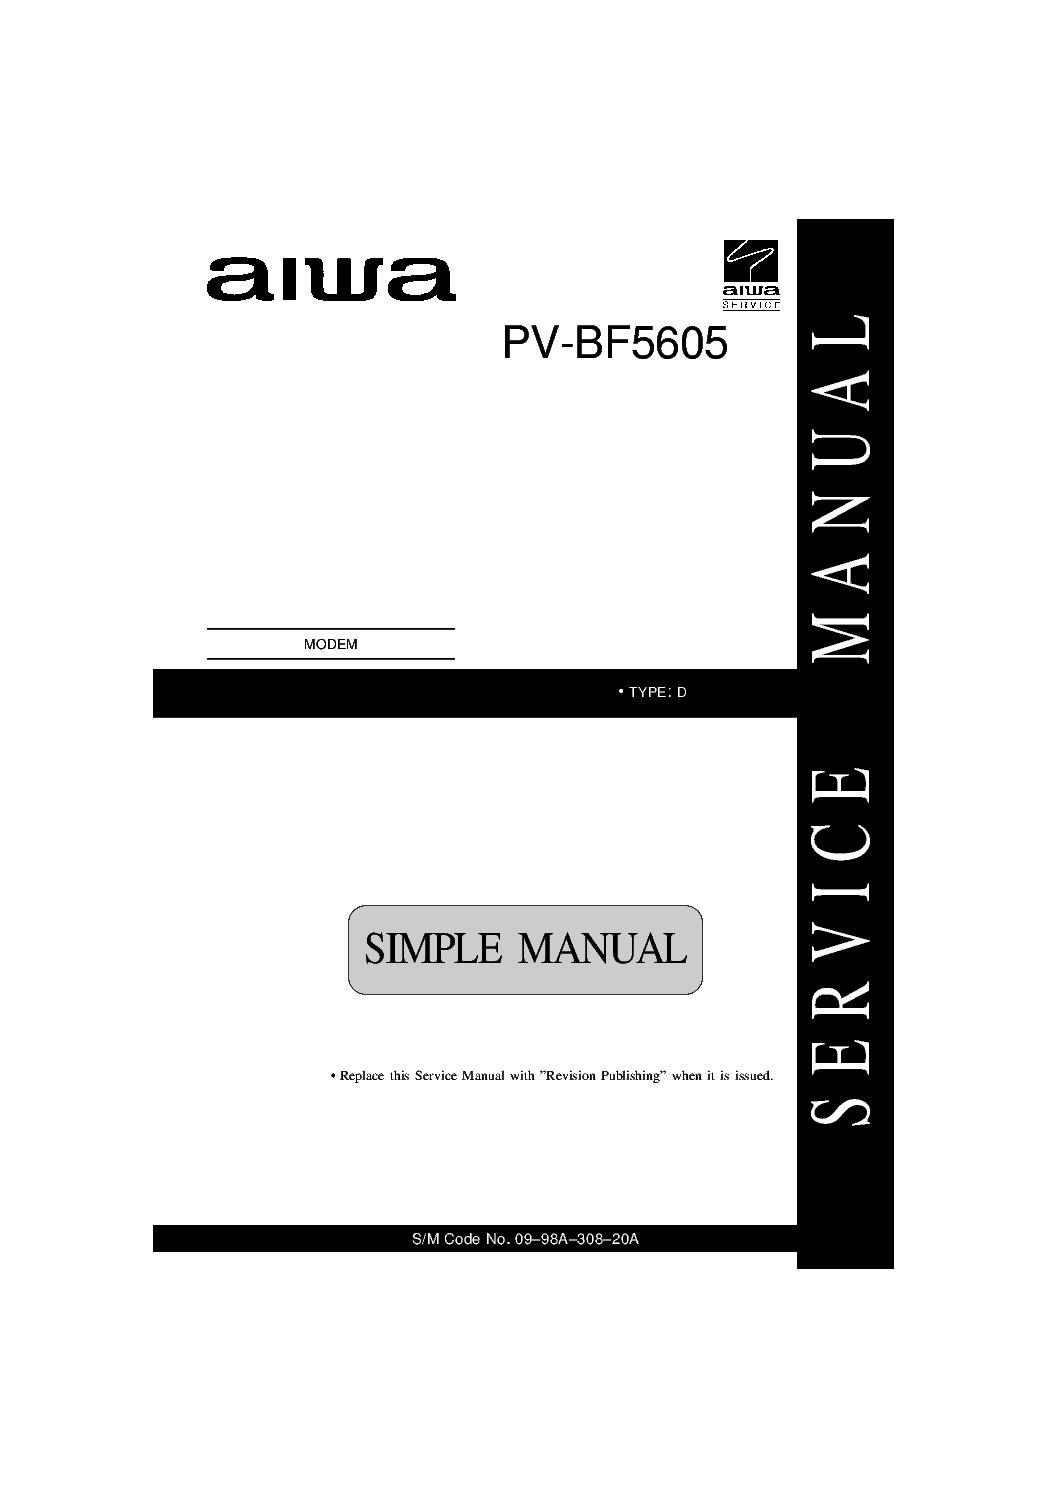 AIWA PV-BF5605 WINDOWS 7 64 DRIVER